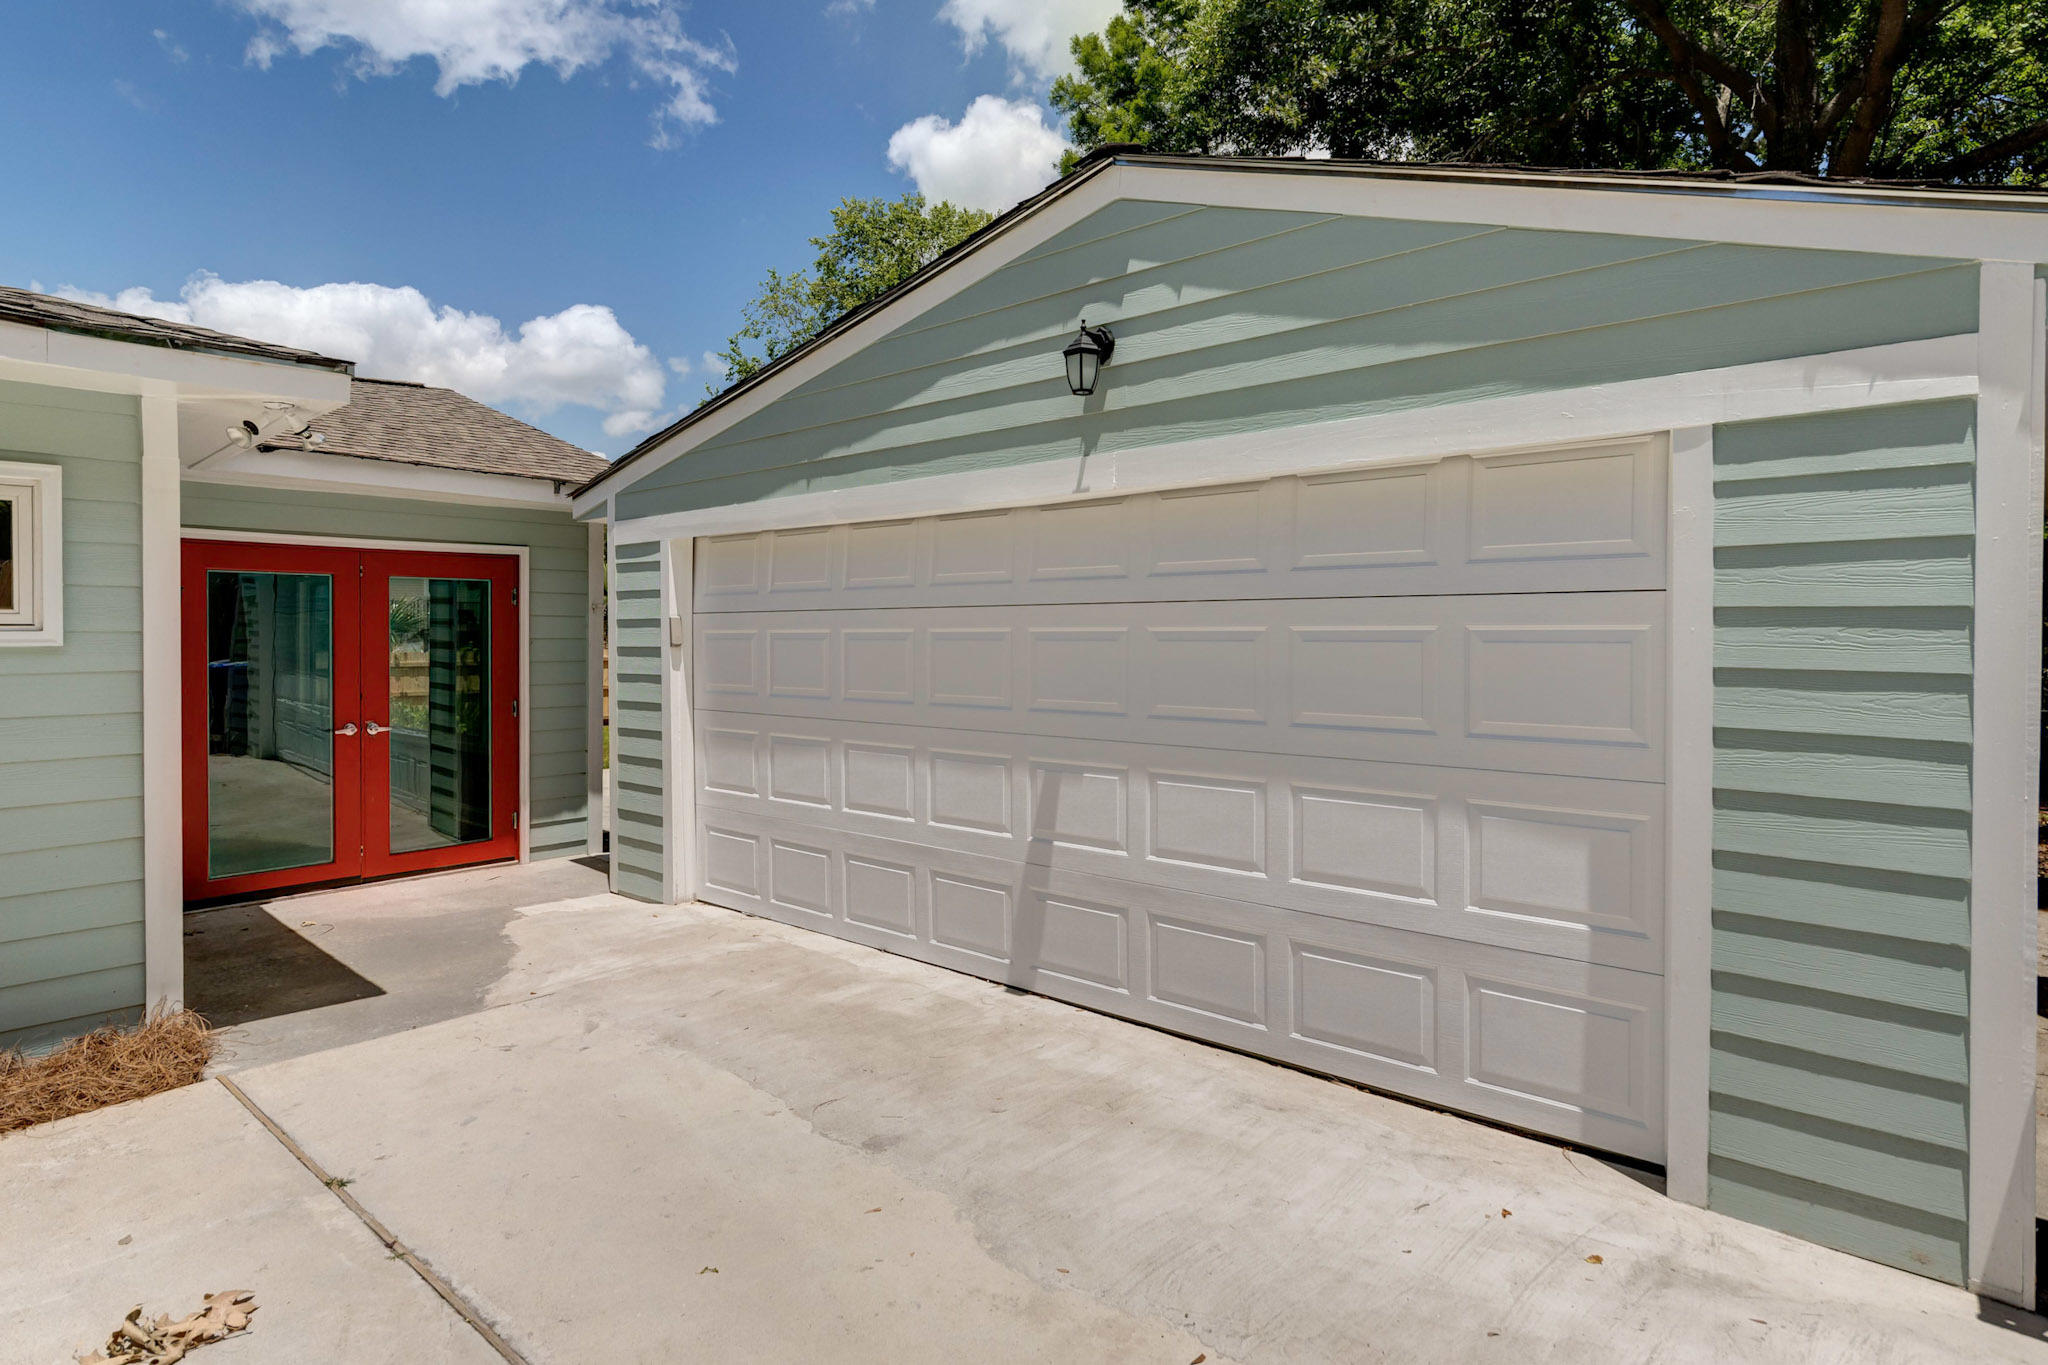 Covington Hills Homes For Sale - 5886 Ryans Bluff, North Charleston, SC - 24